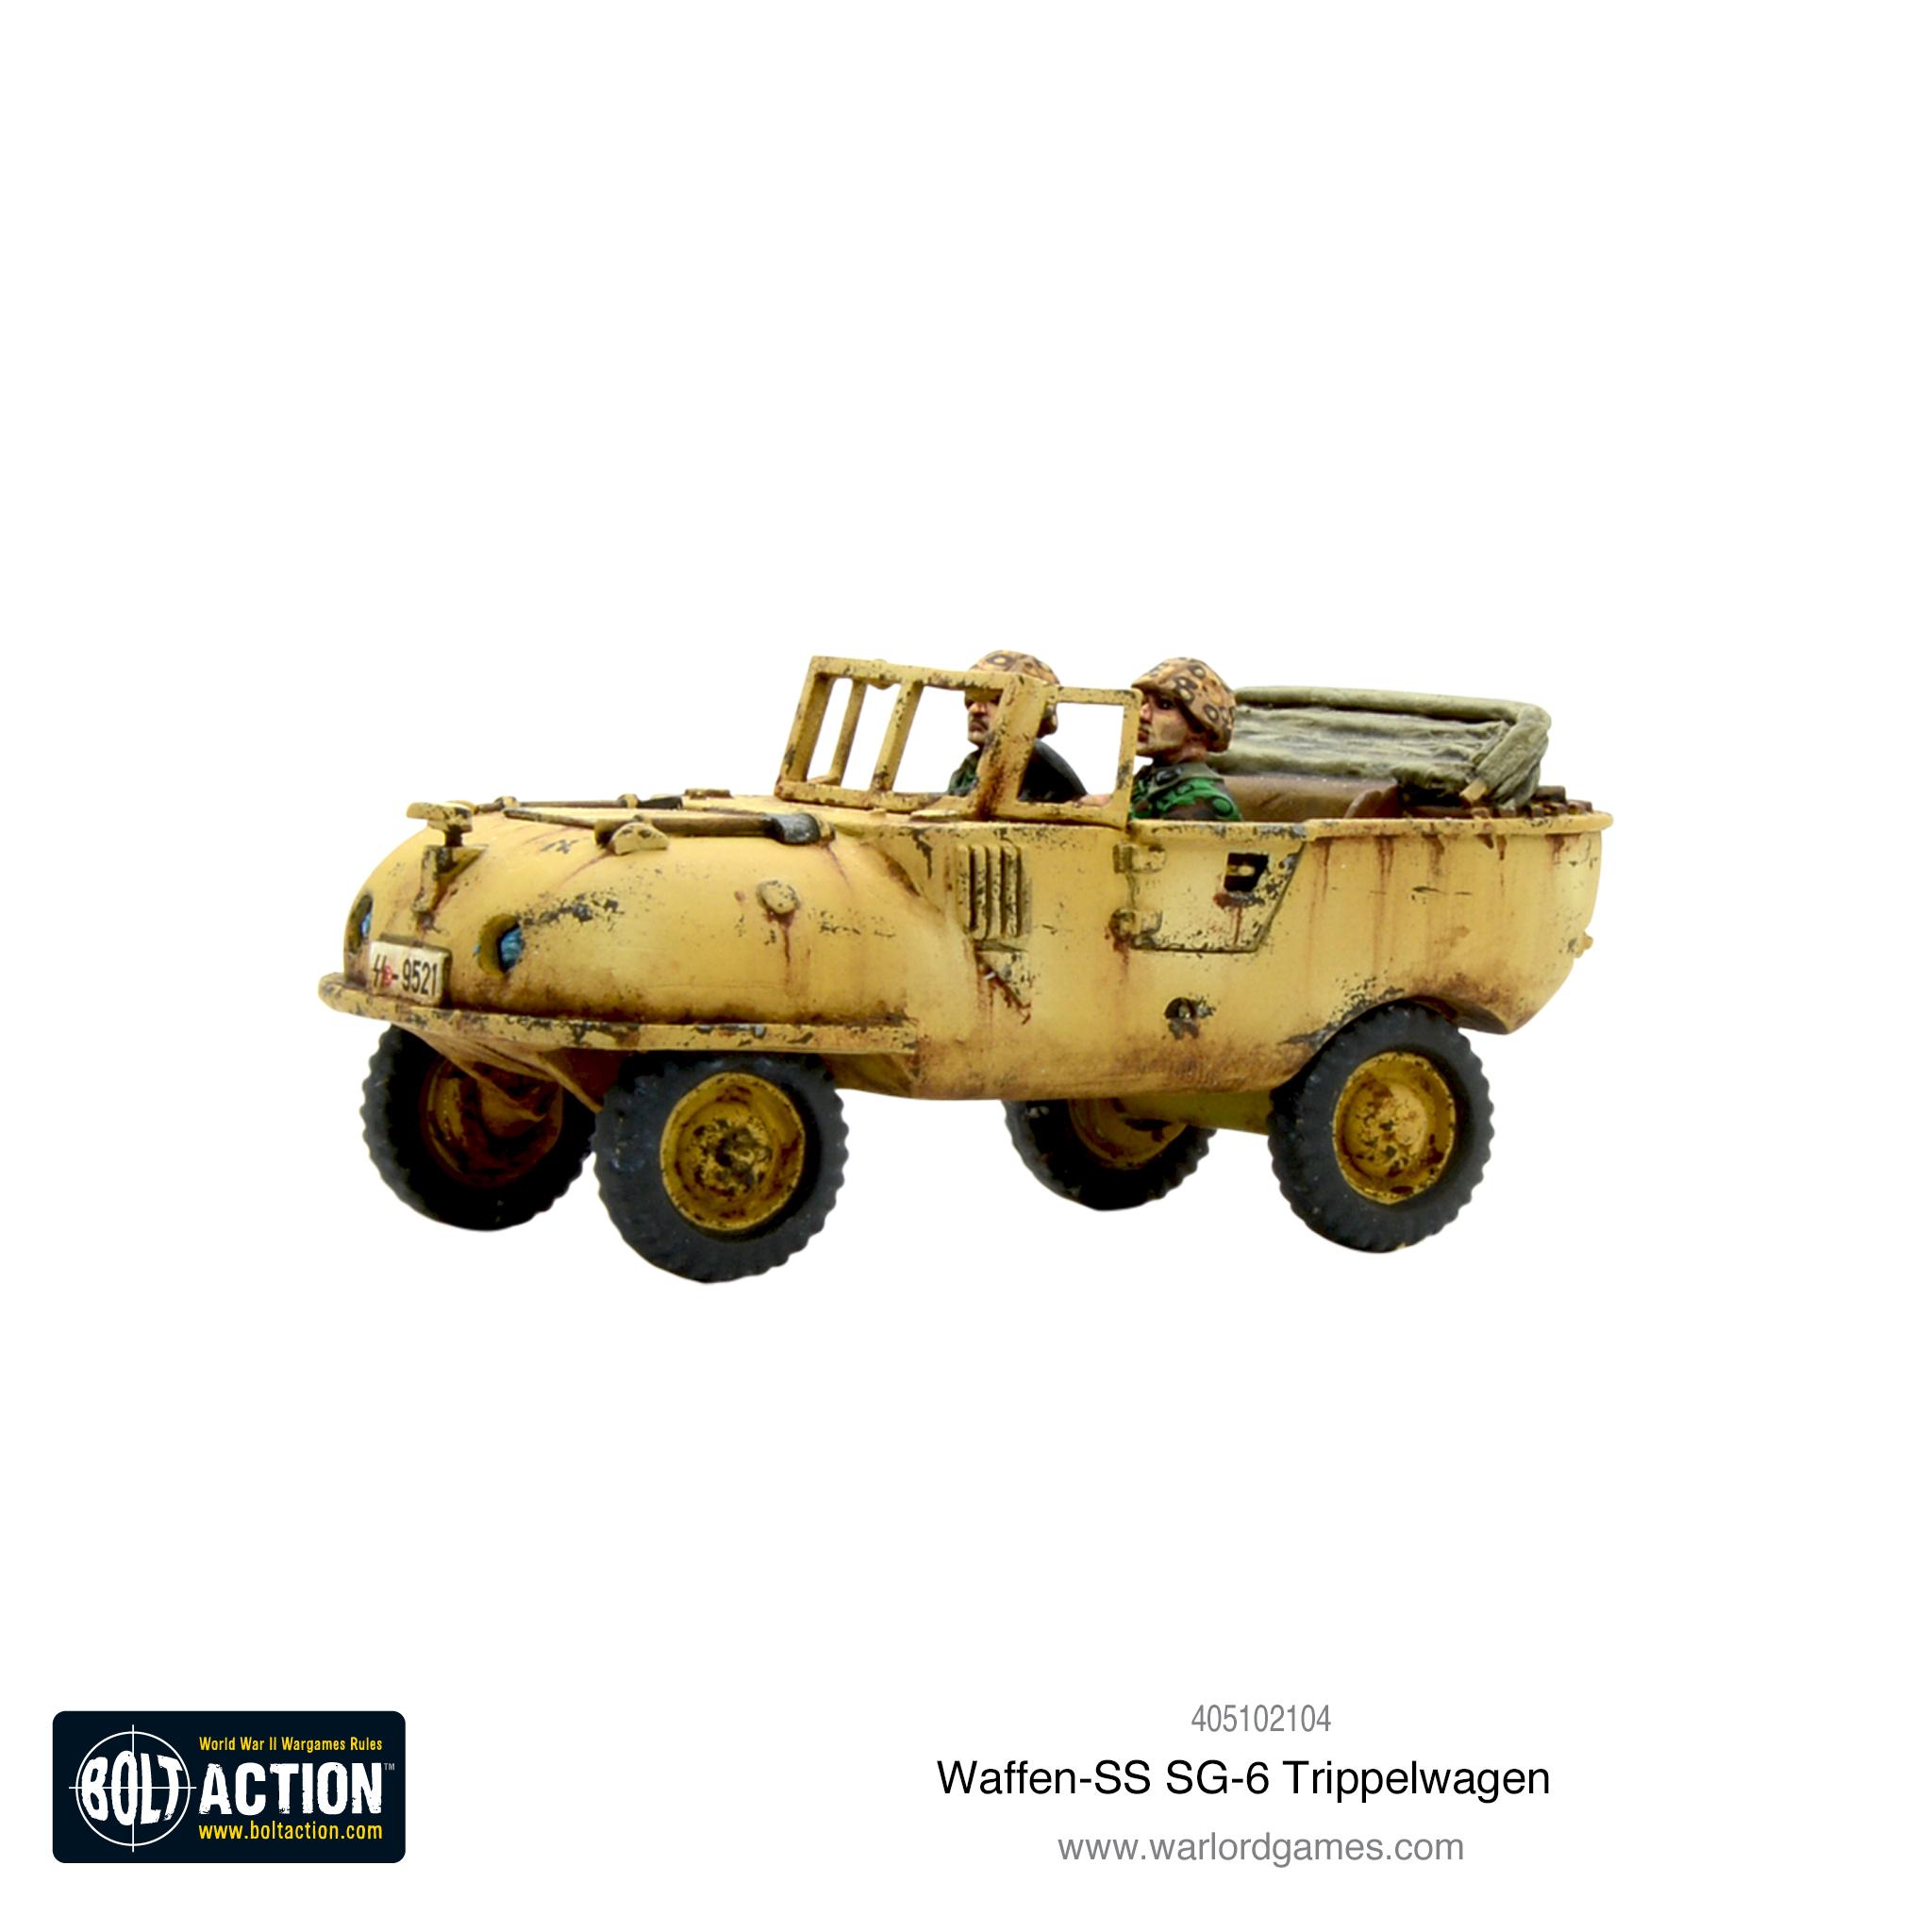 Waffen-SS SG-6 Trippelwagen